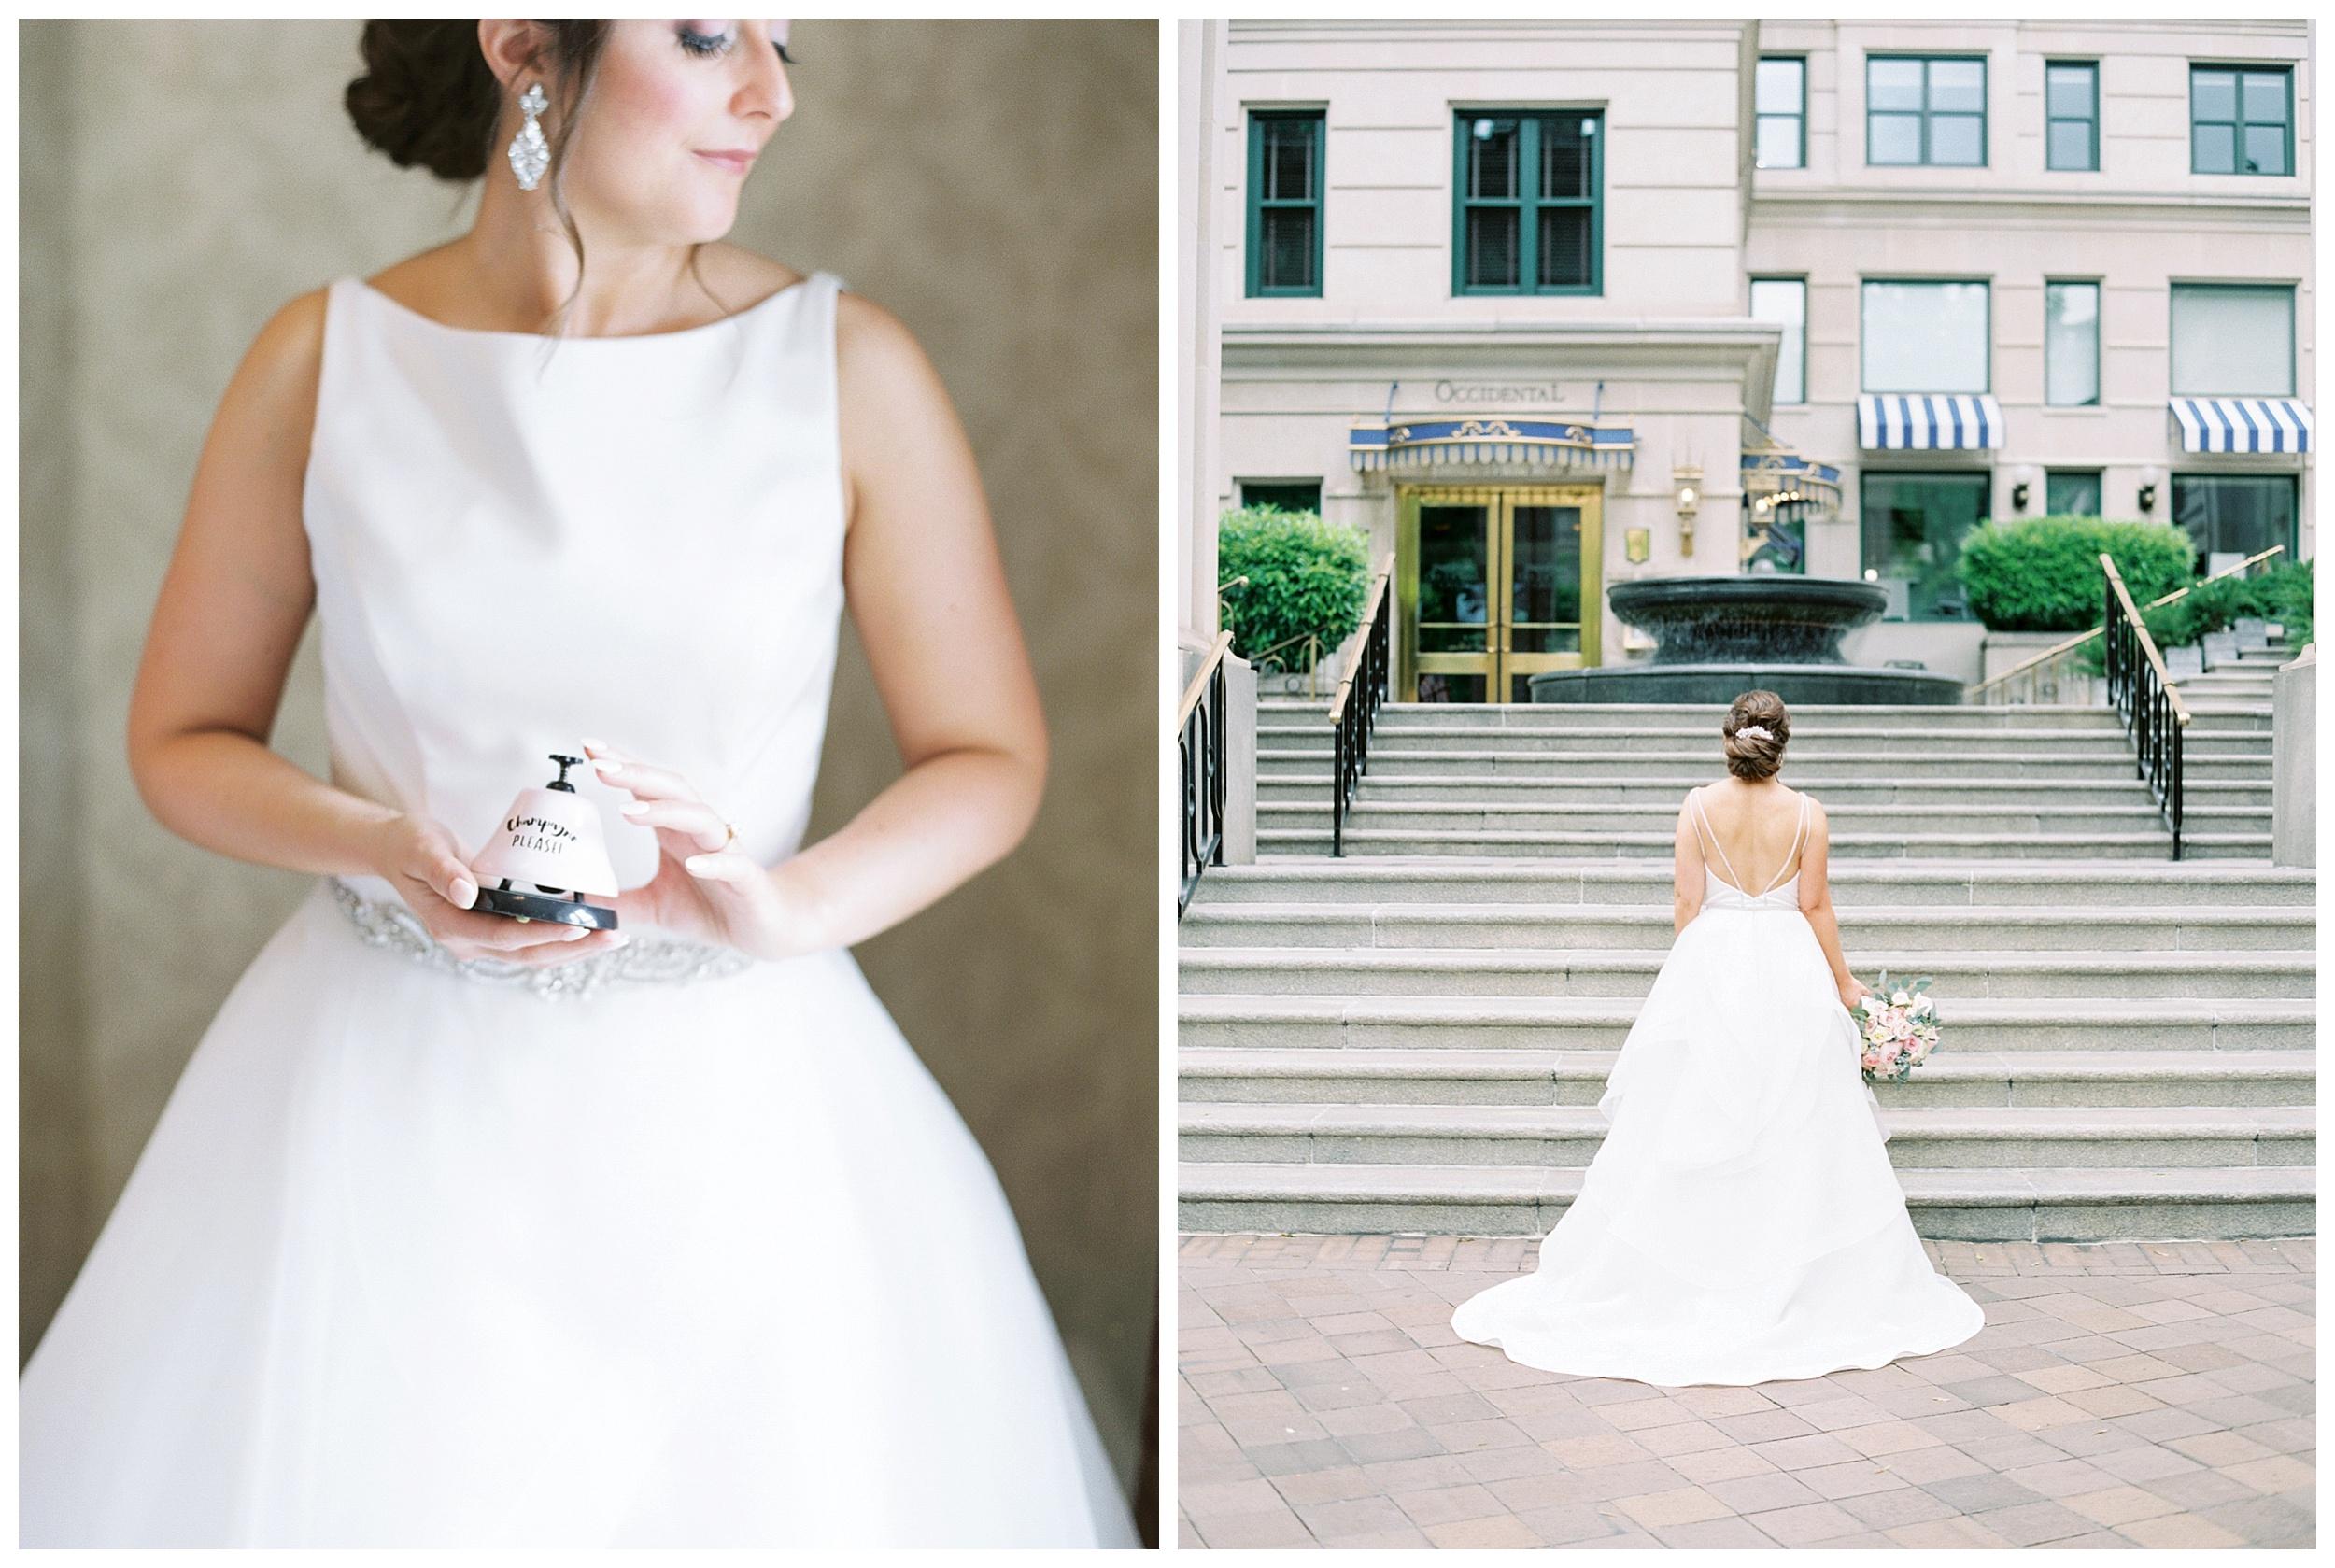 DAR Constitution Hall Wedding Wedding | Daughters of the American Revolution Wedding | District of Columbia Film Wedding Photographer Kir Tuben_0026.jpg